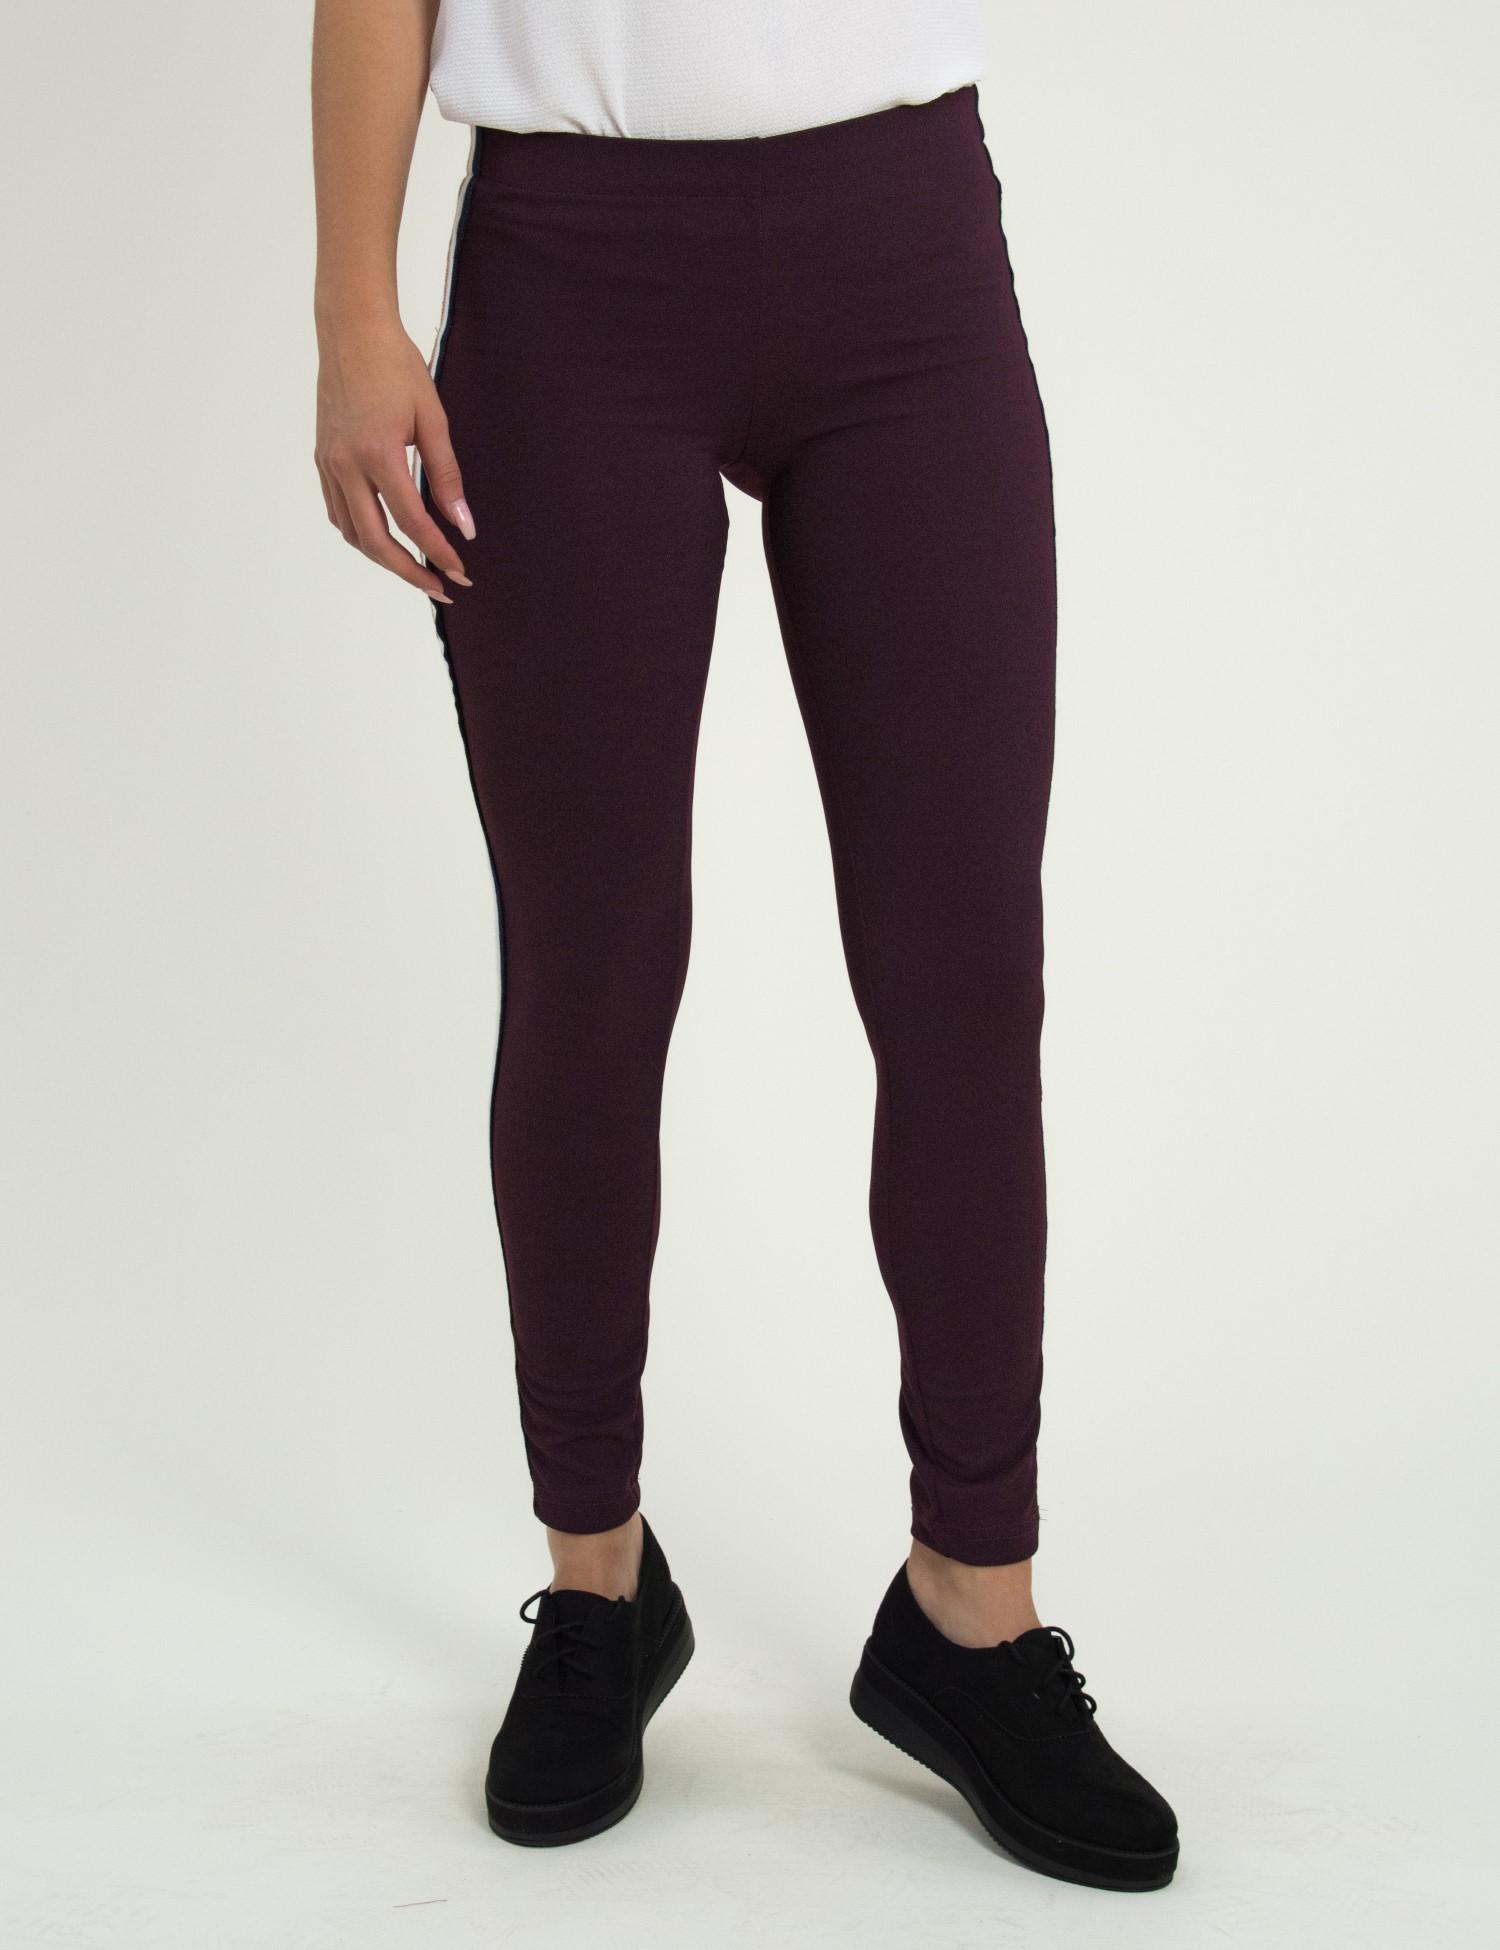 3441c0bbd02 Γυναικείο μπορντό ελαστικό παντελόνι Coocu ρίγες σωλήνας 41167F